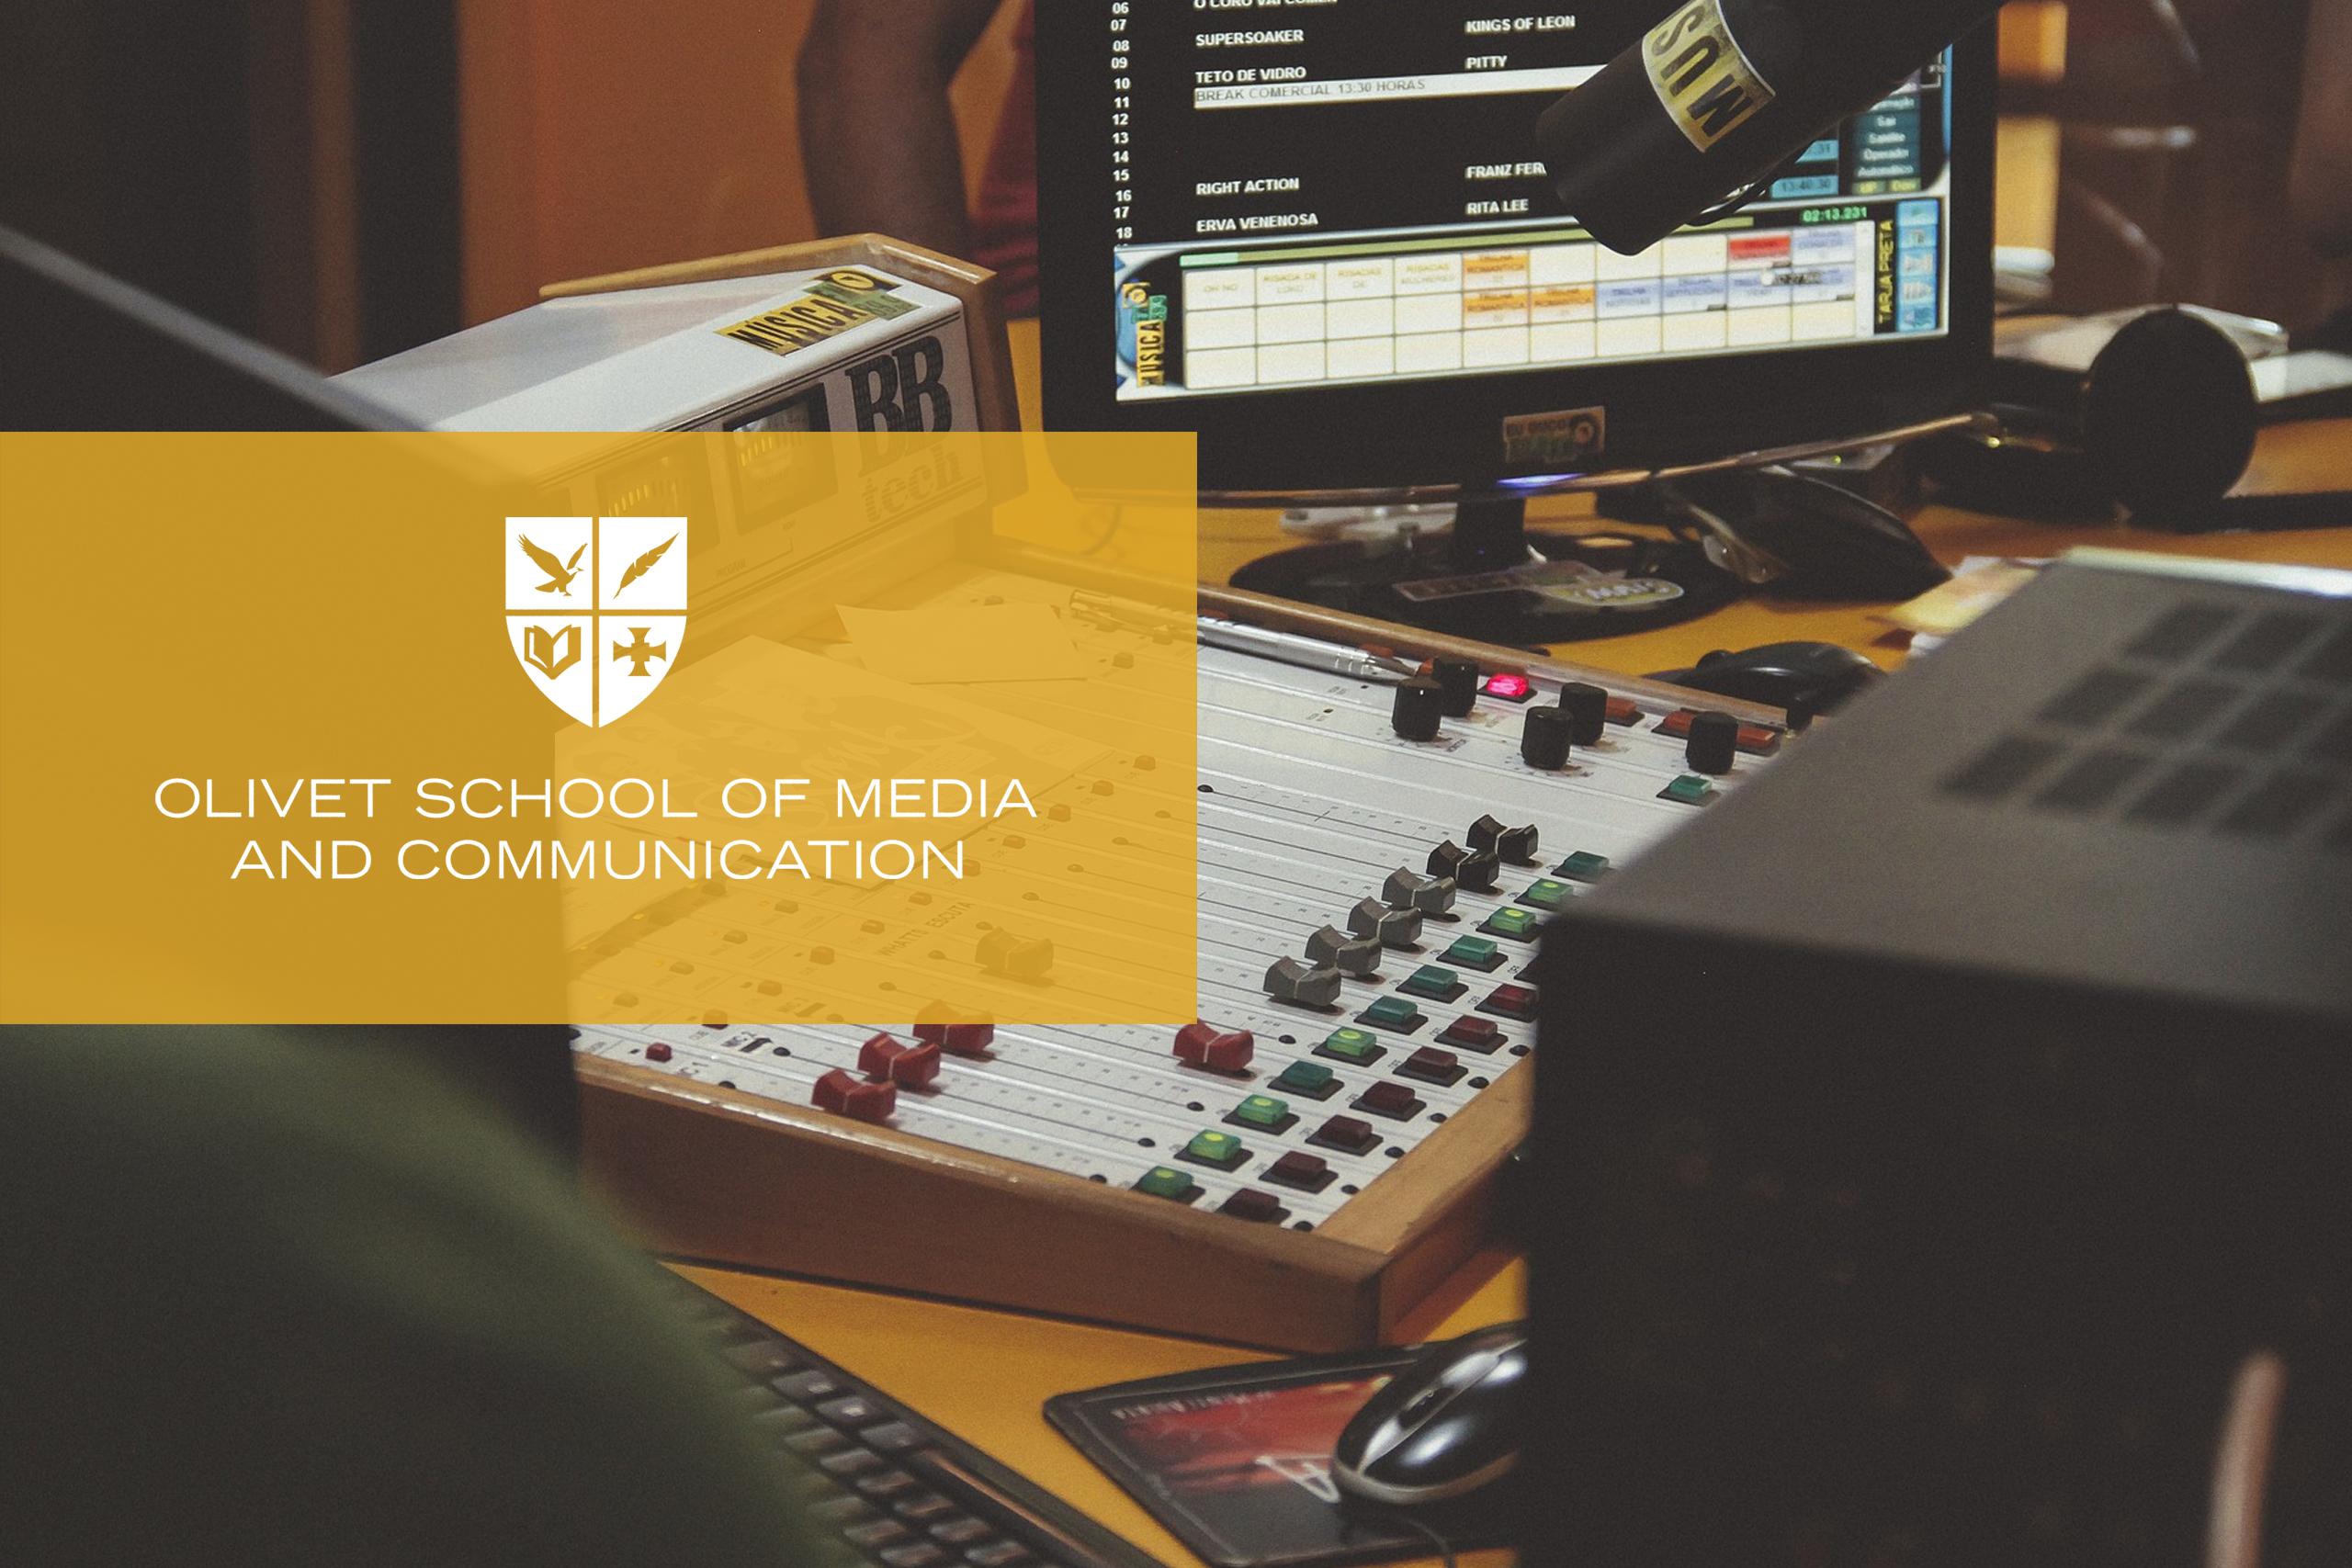 olivet-university-olivet-media-school-launches-updated-curricula-winter-2017